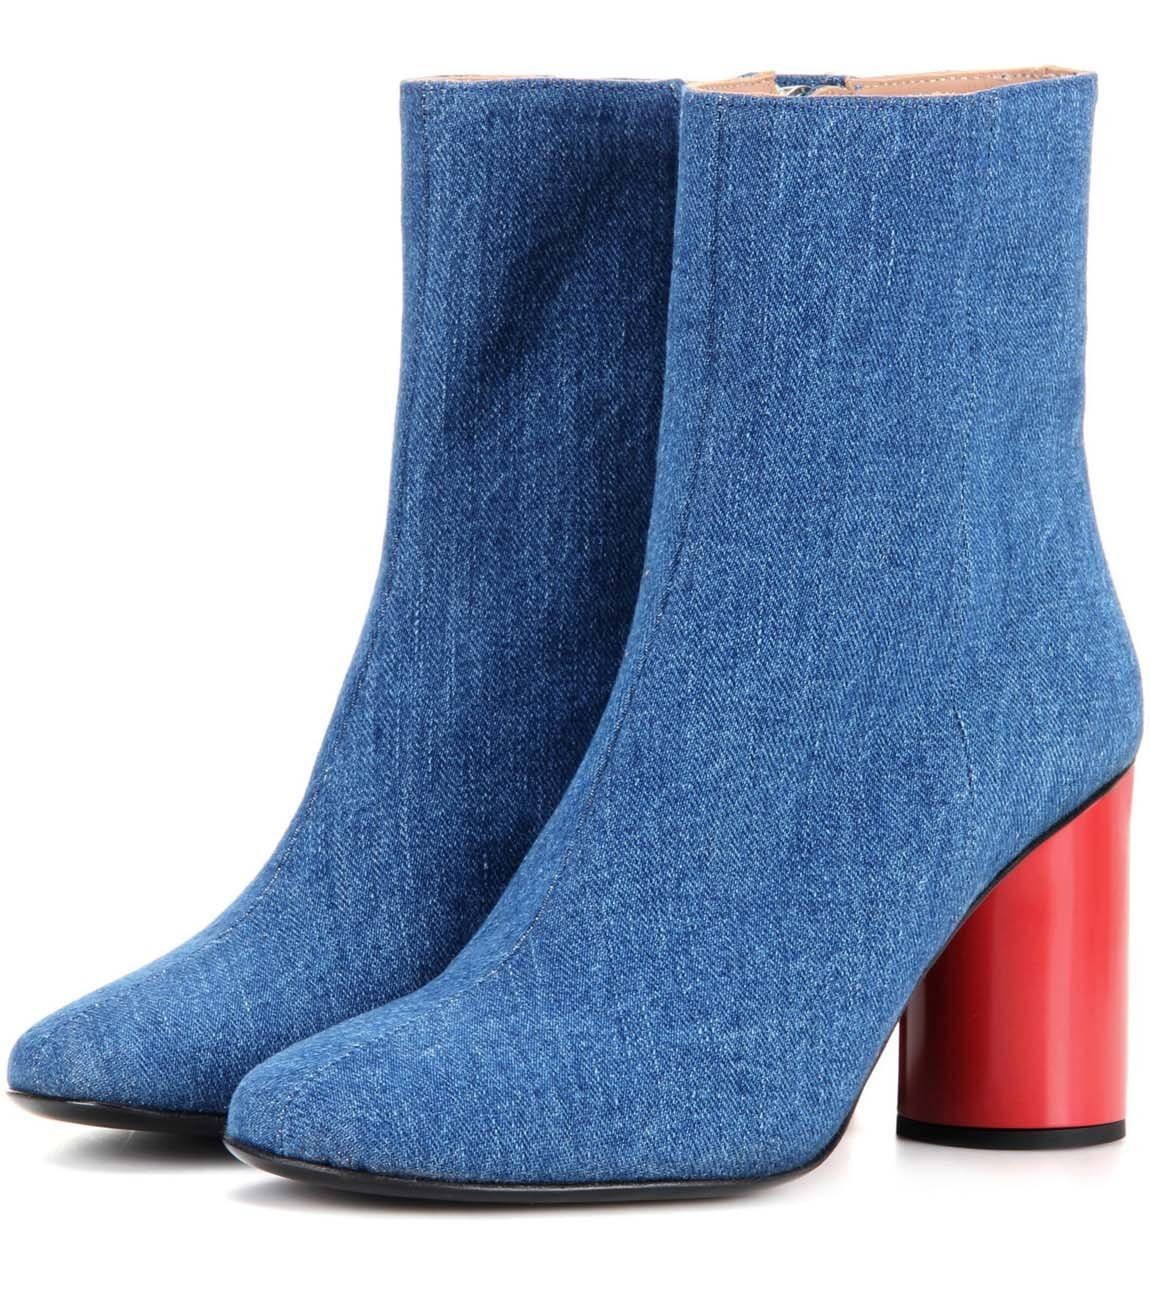 GONGFF Hellblaue Denim Ankle Stiefel Damen Rote Zylinder Rough Ankle Stiefel